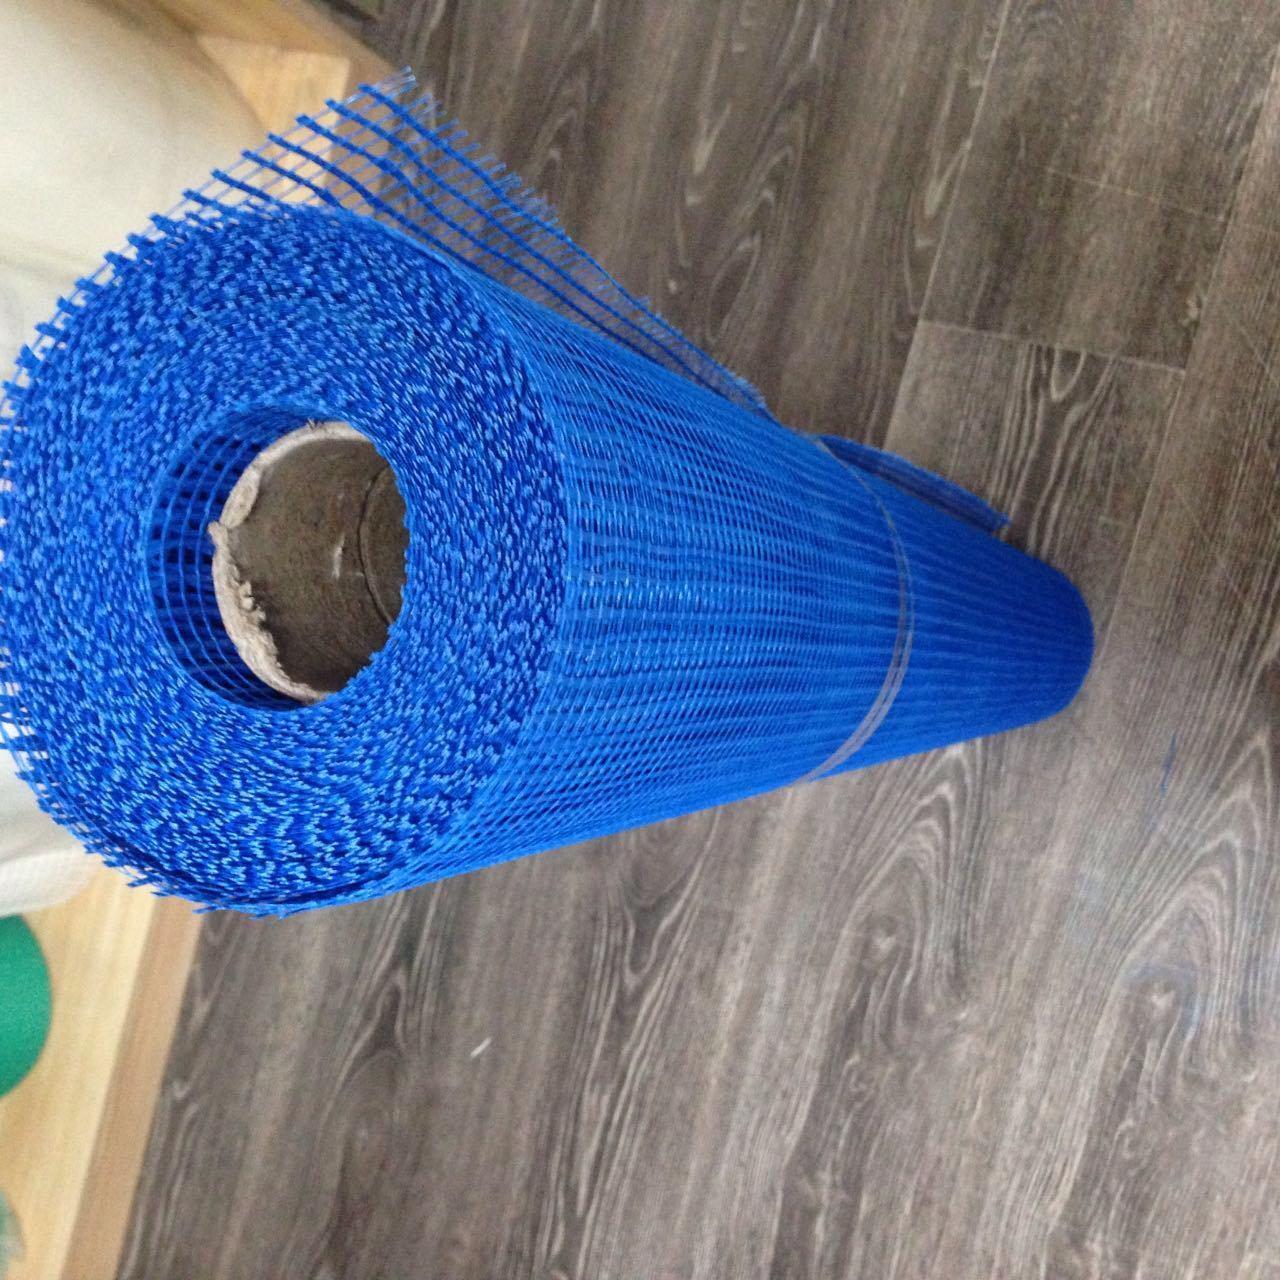 120g High Quality Fire Resistant Alkali-Resistant Fiberglass Cloth